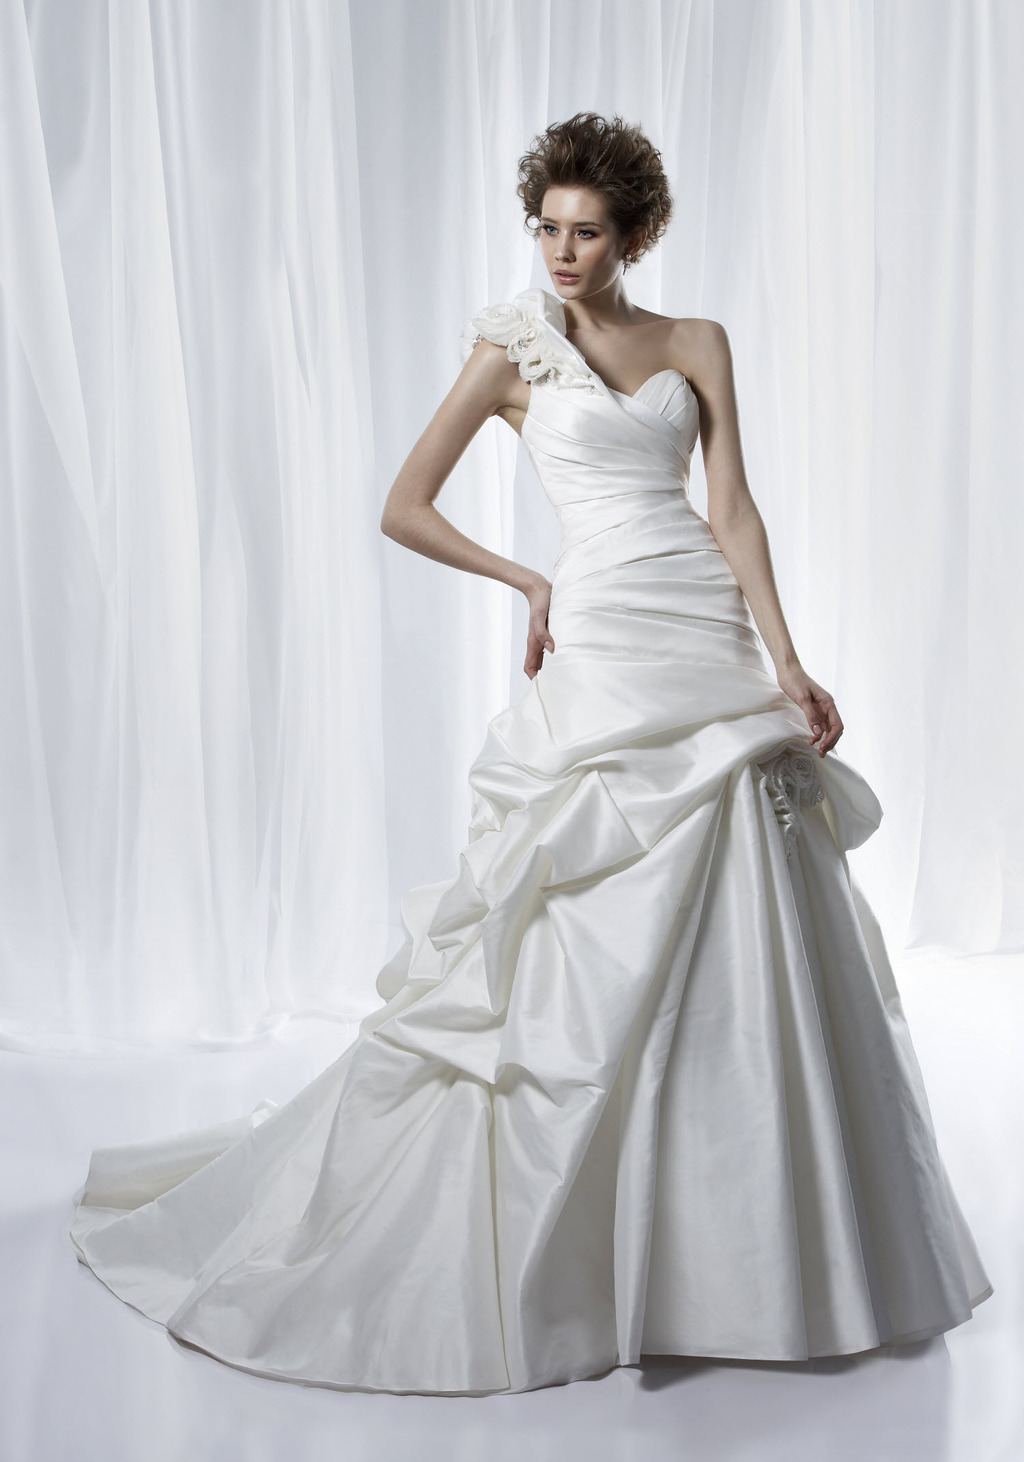 Romantic-ivory-wedding-dress-one-shoulder-drop-waist-modern-bustle-anjoliue-2012-wedding-dress.full